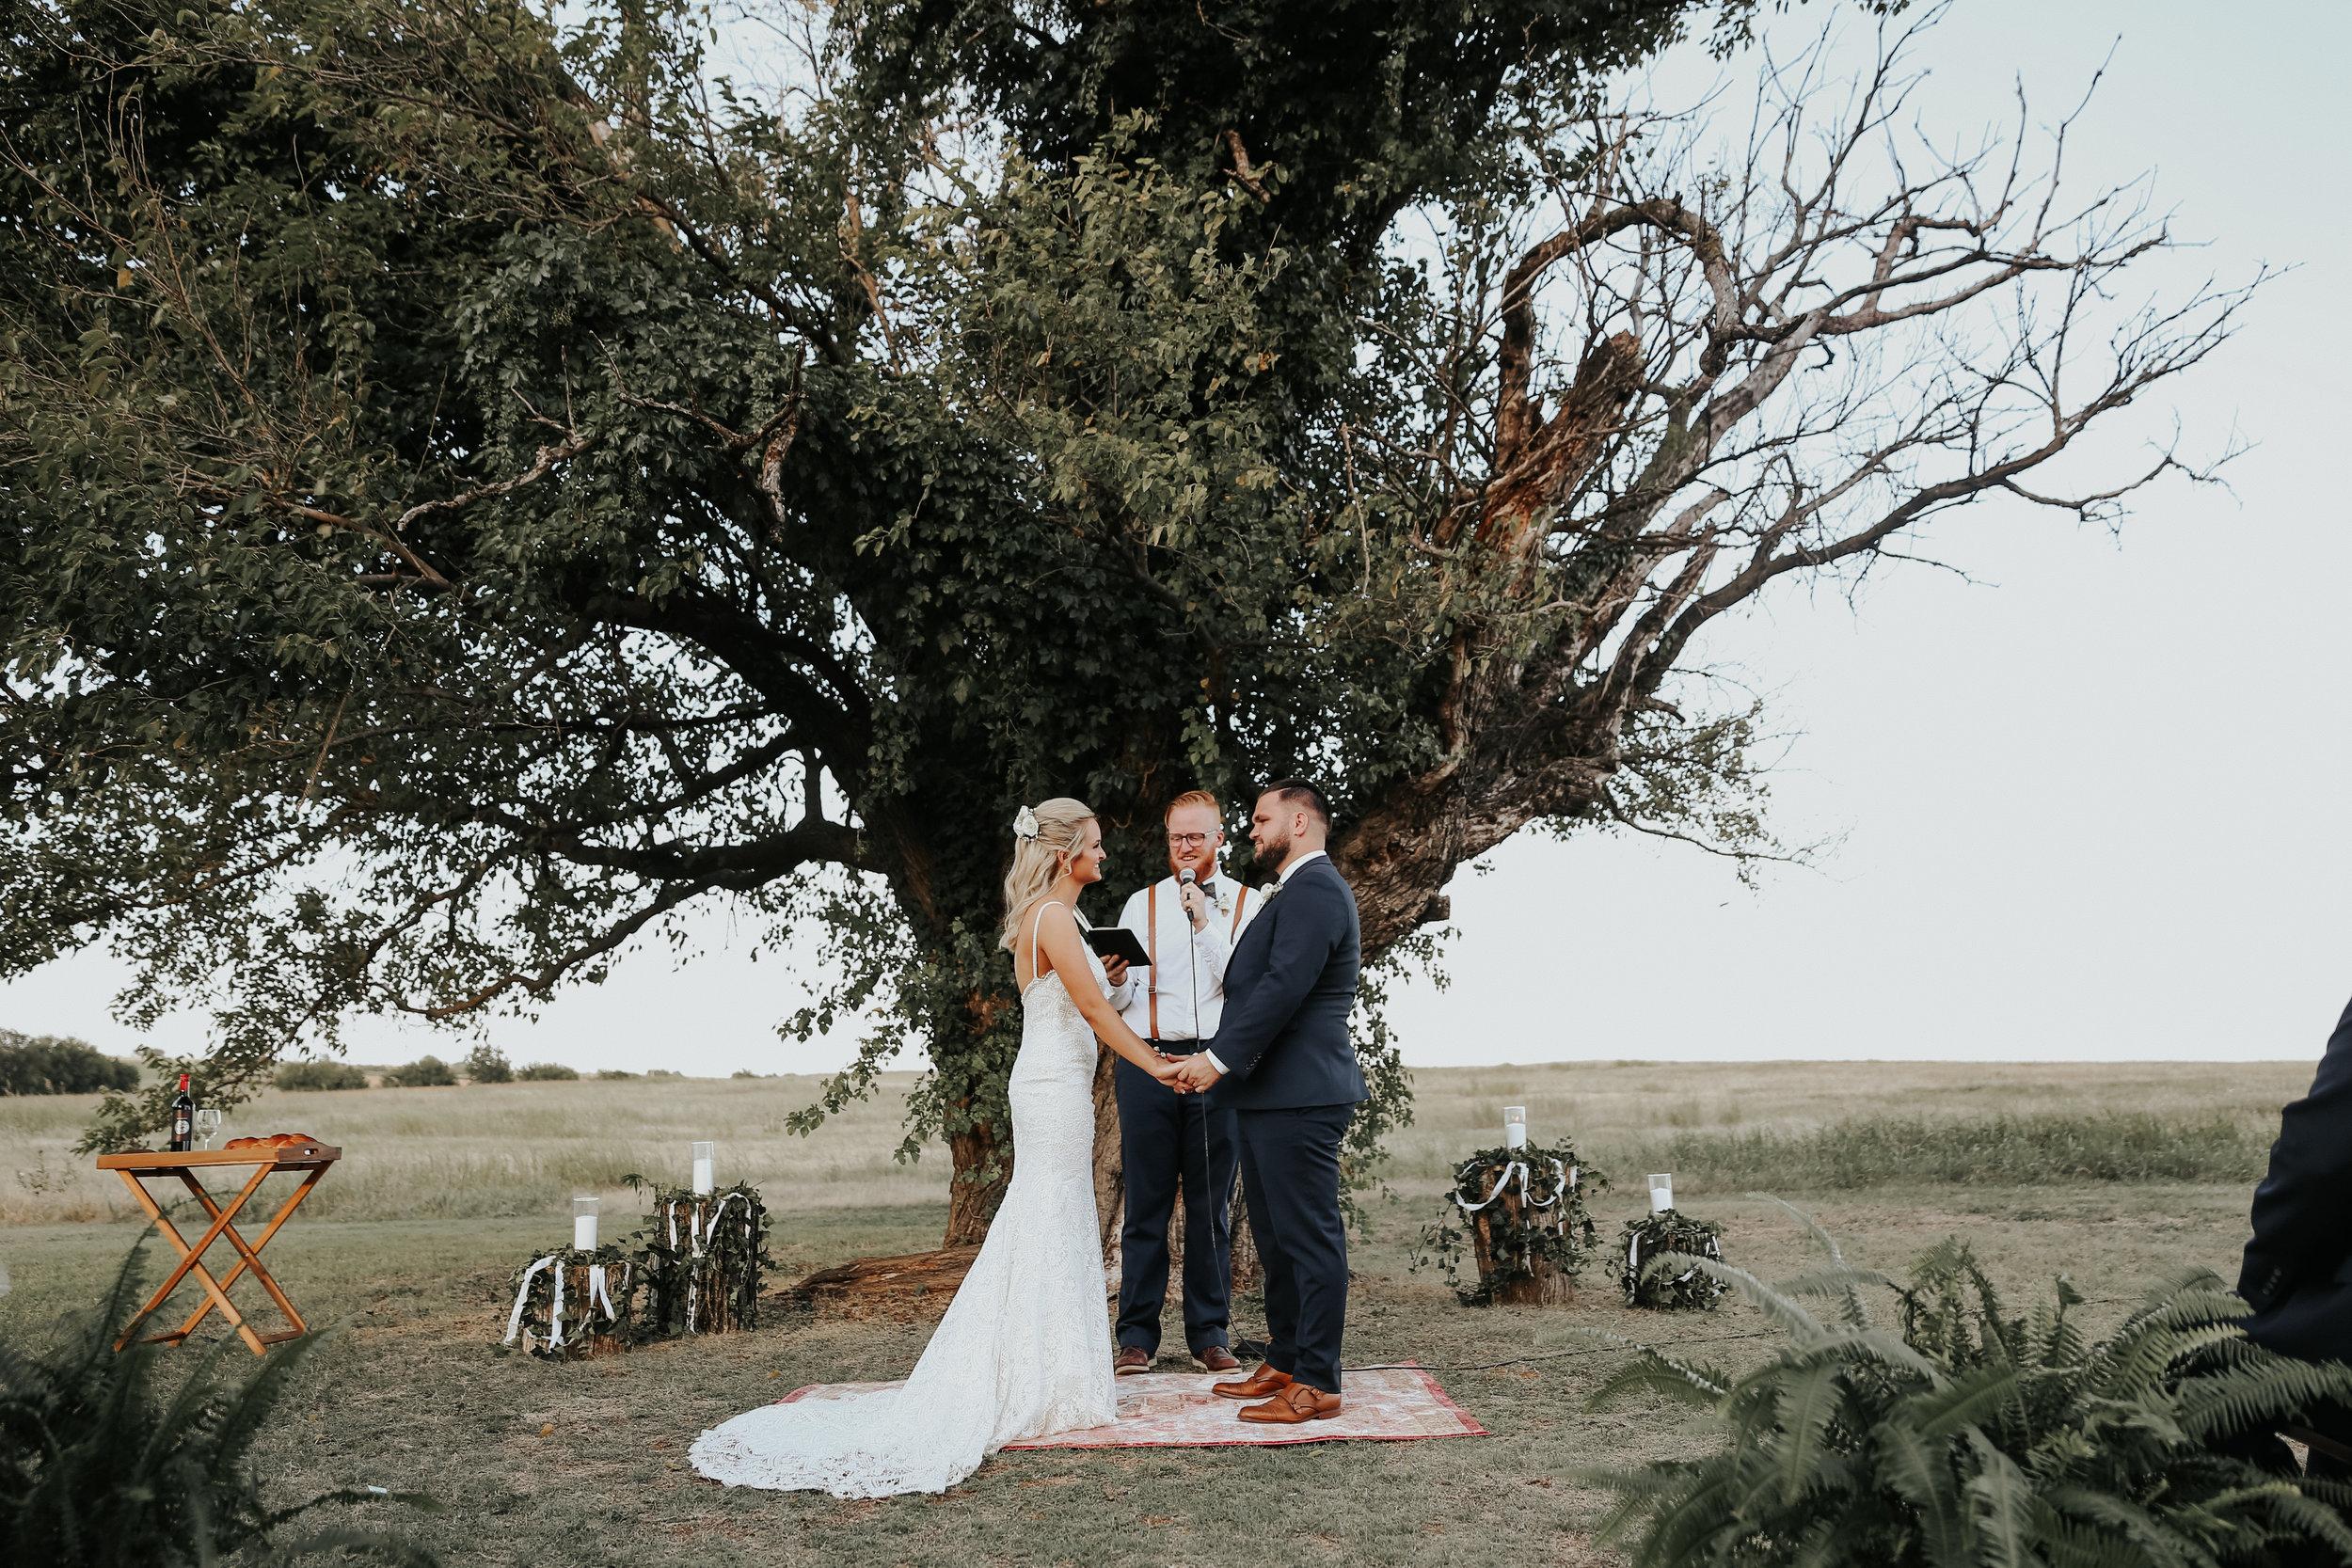 Backyard_Wedding_Oklahoma_MelissaMarshall_19.jpg